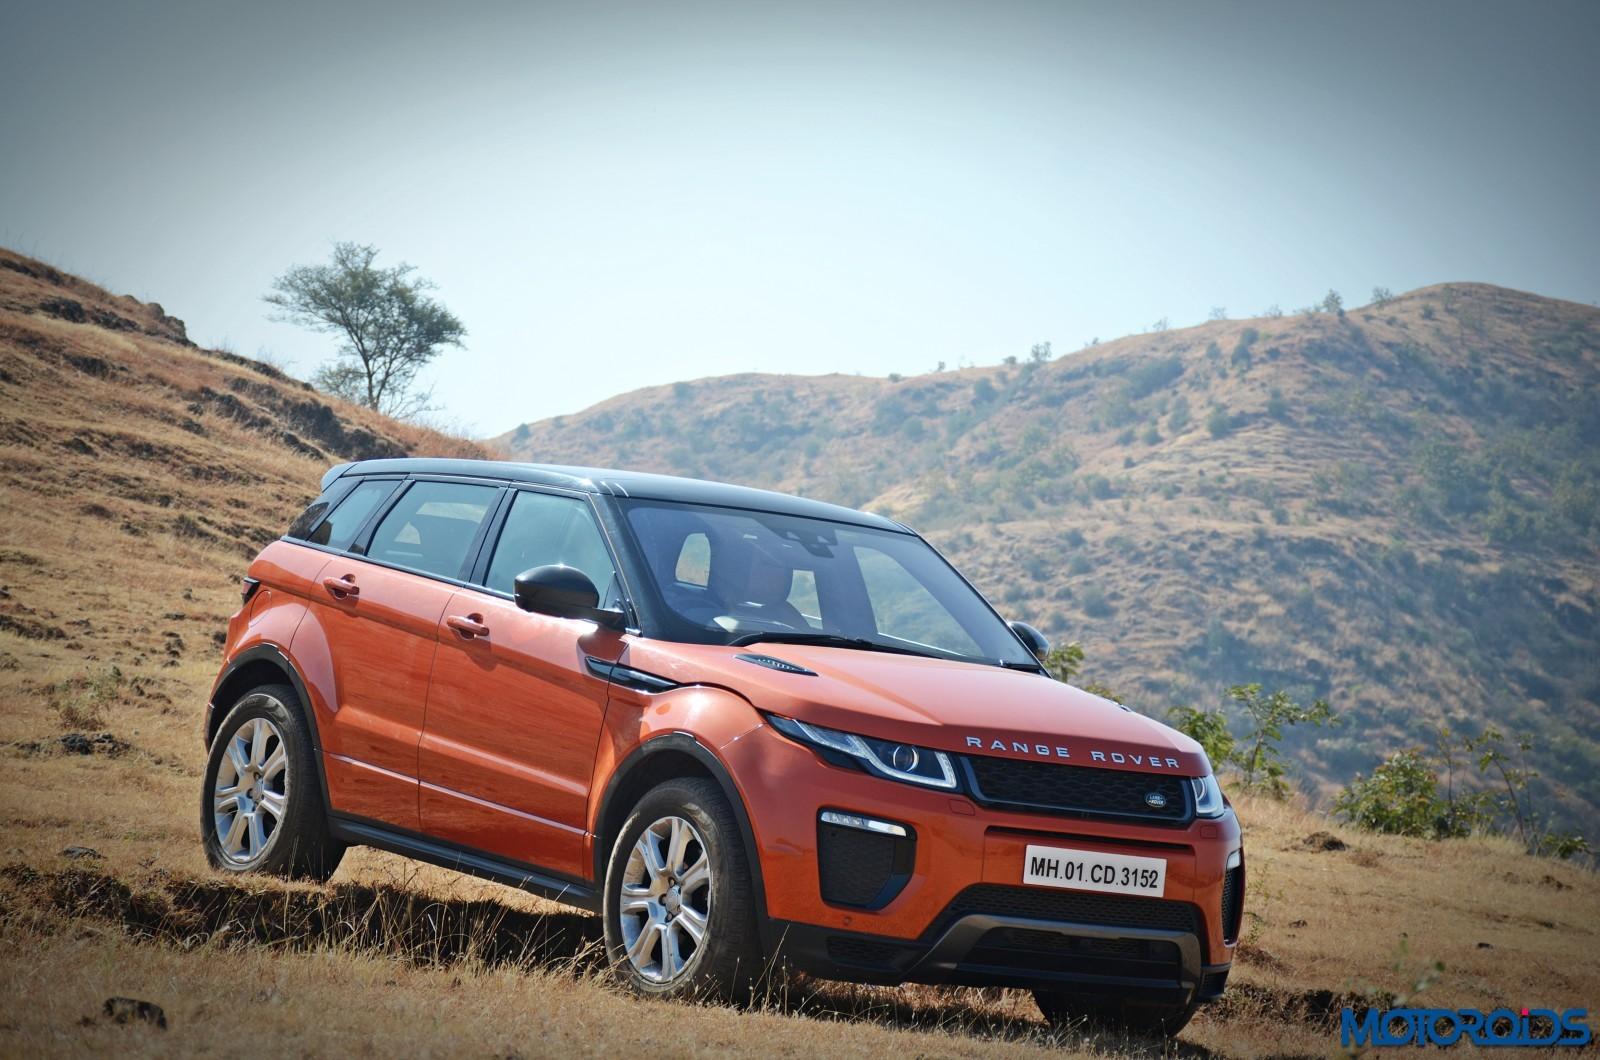 Range-Rover-Evoque-orange-6